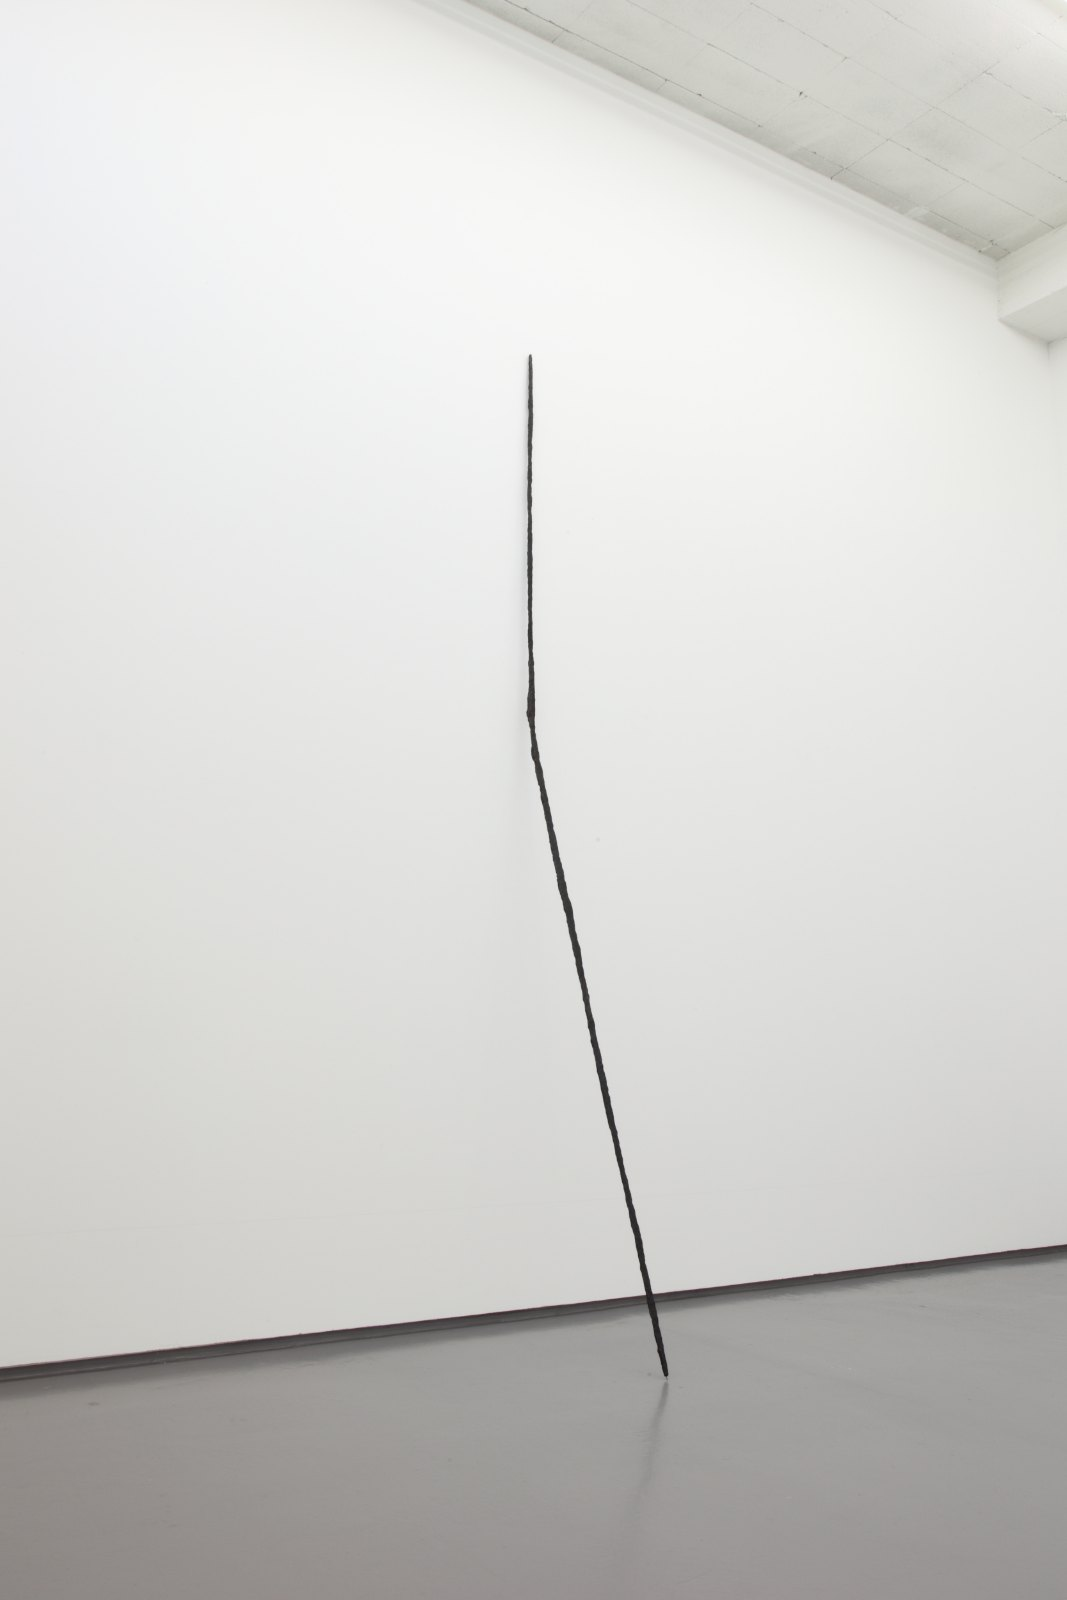 Jan Groth, Sculpture I, 1990, Bronze, H 340 cm